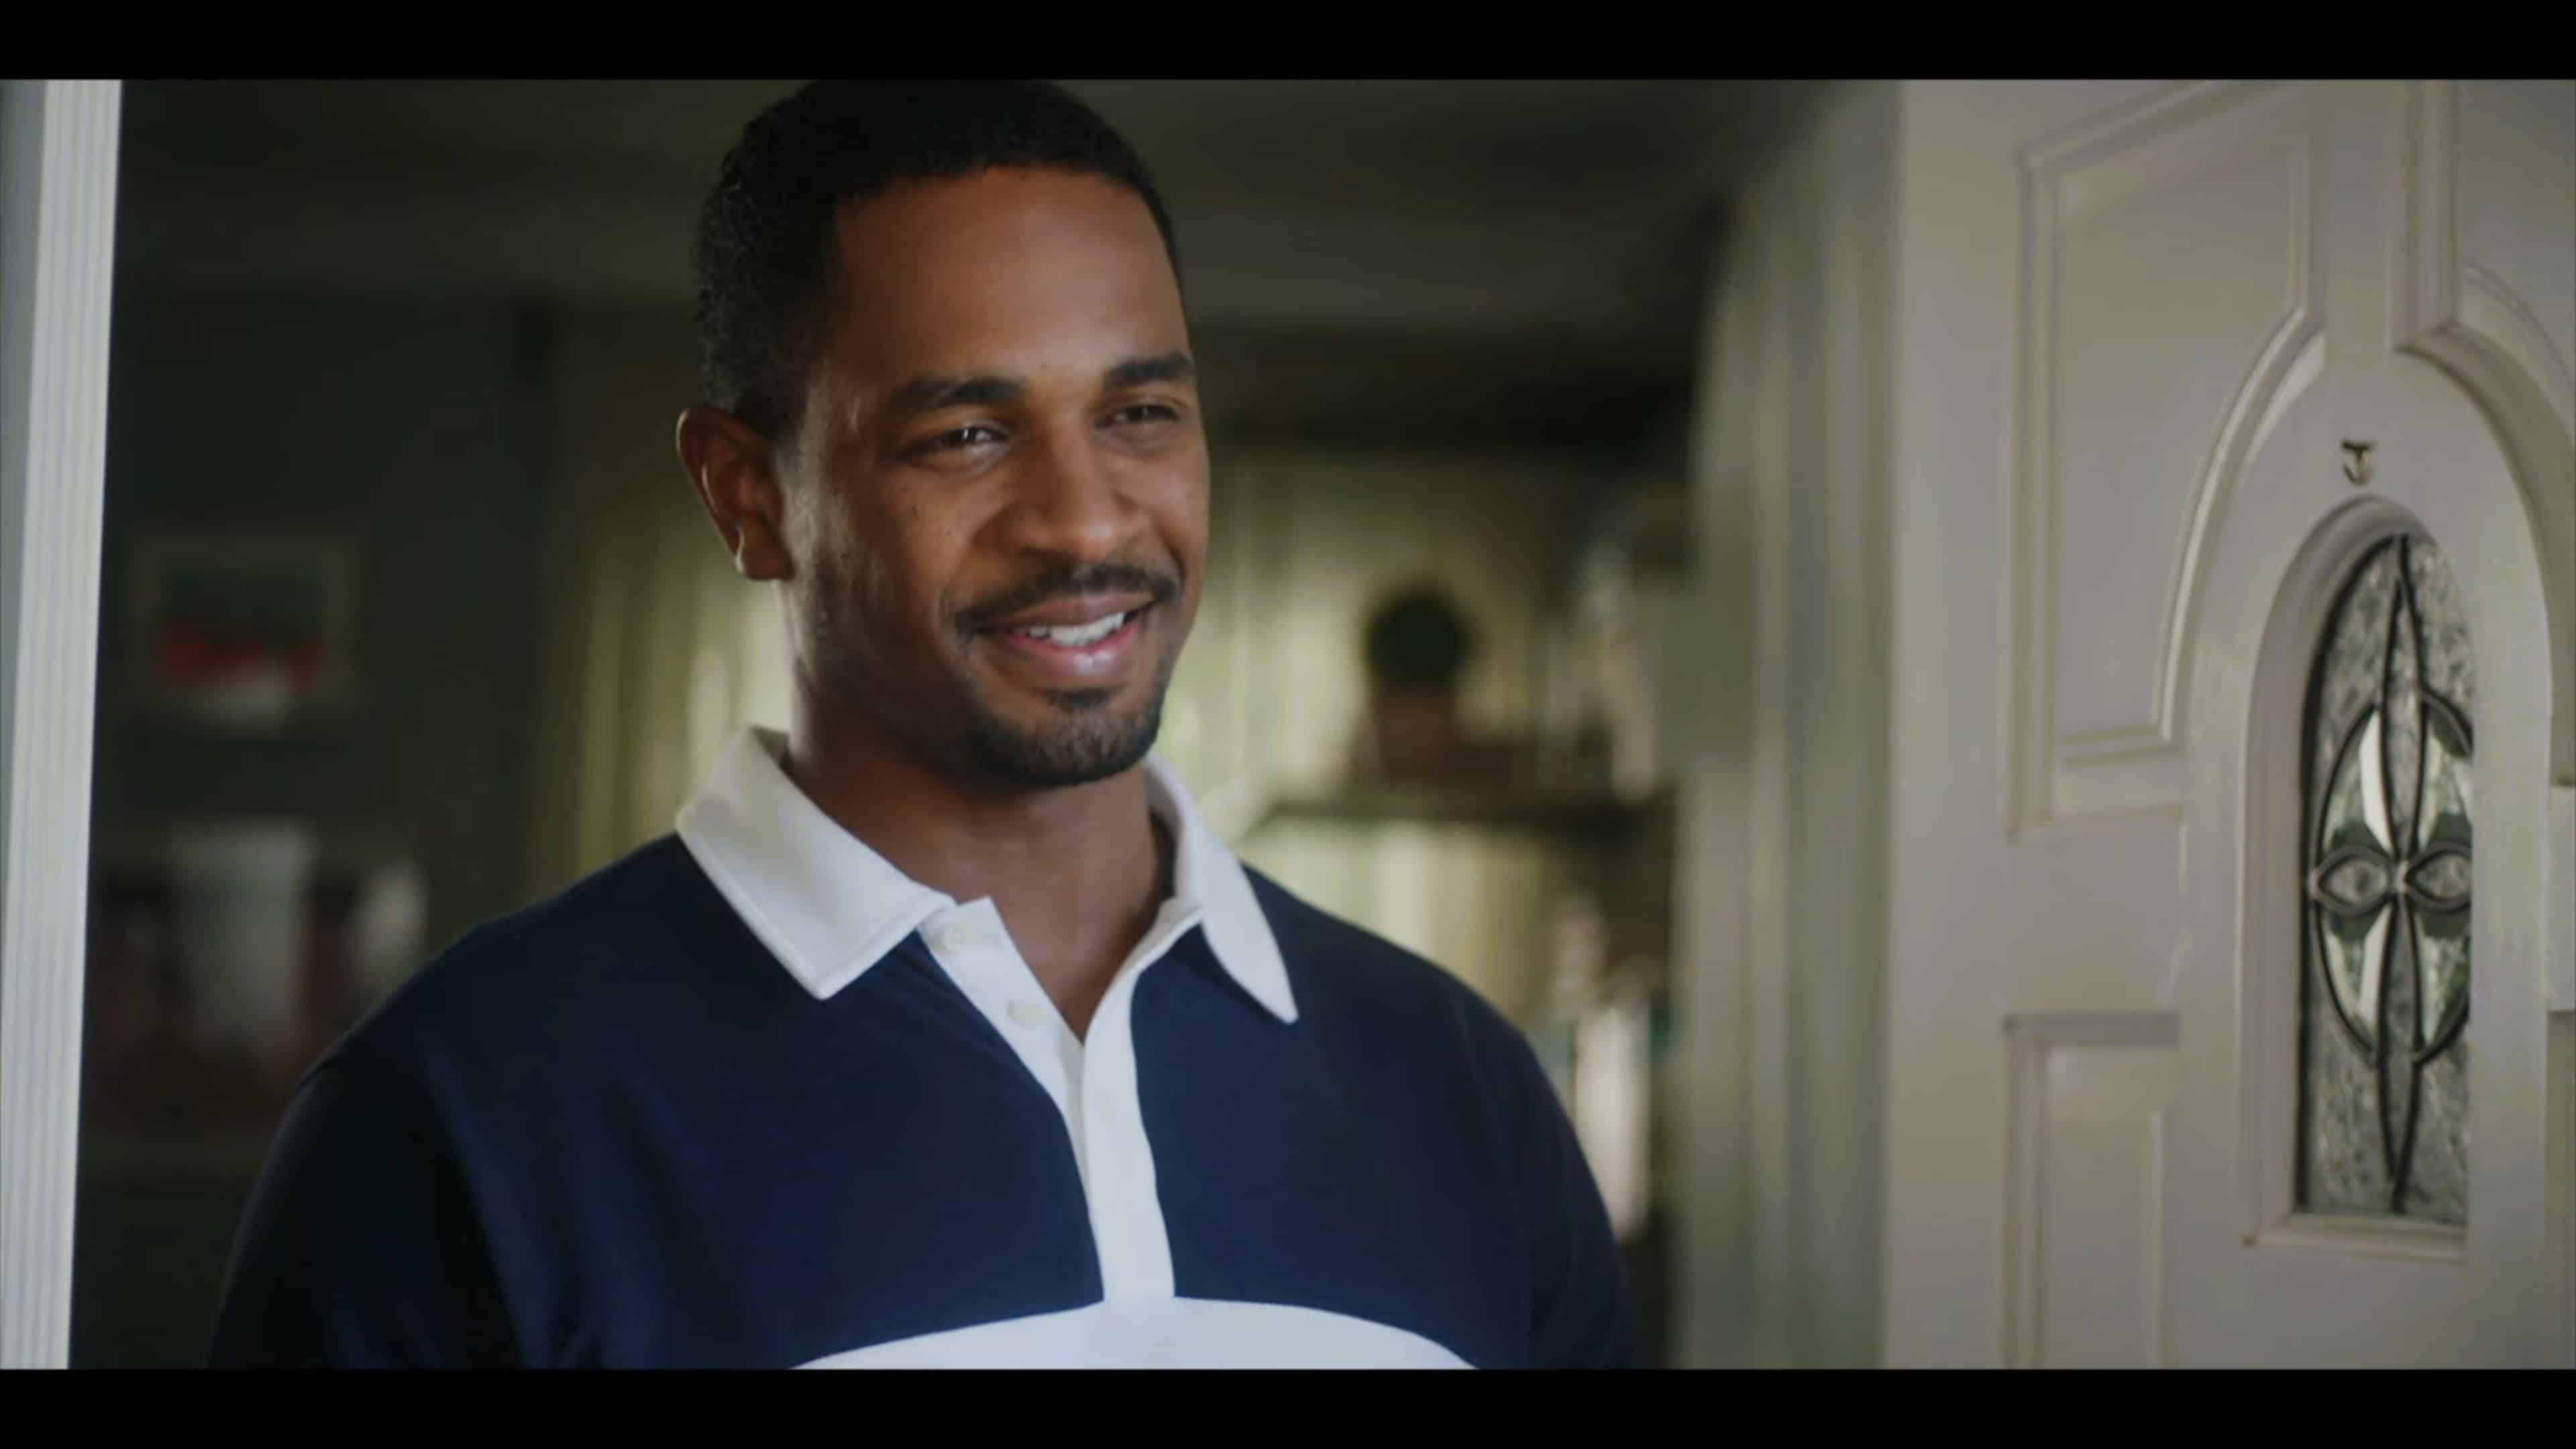 Doug (Damon Wayans Jr.) smiling, answering his door